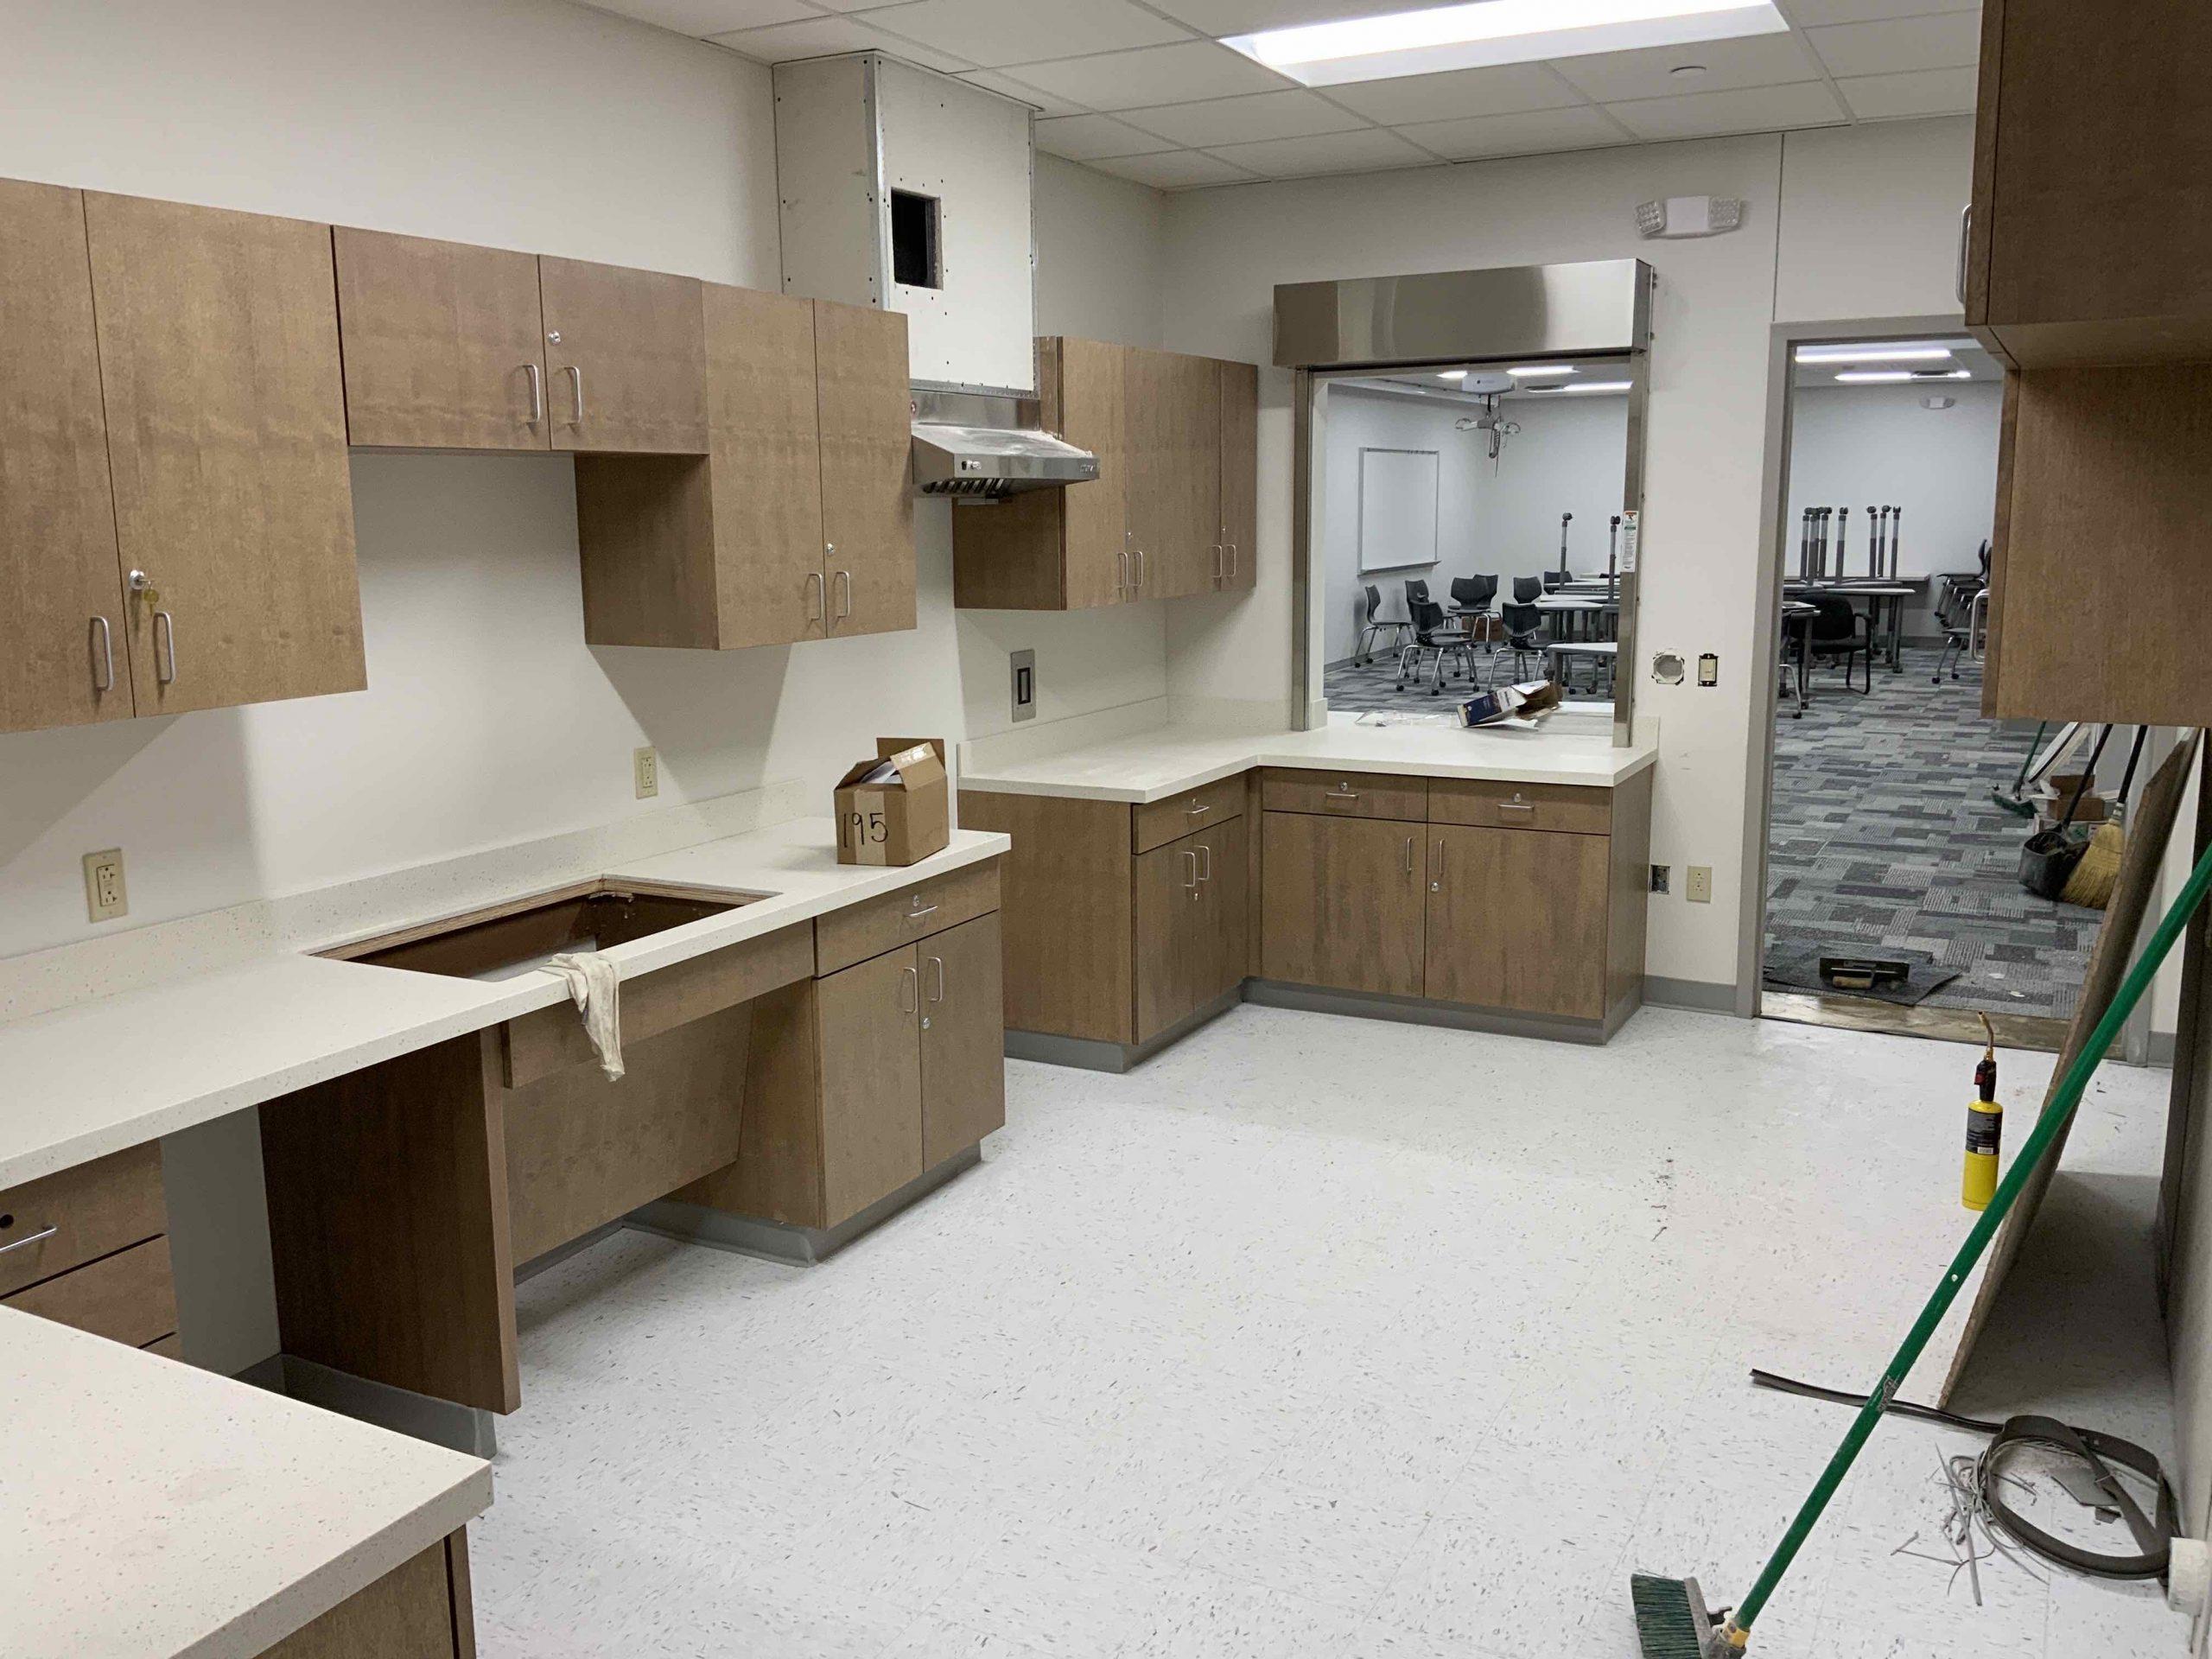 Classroom Renovation image 1